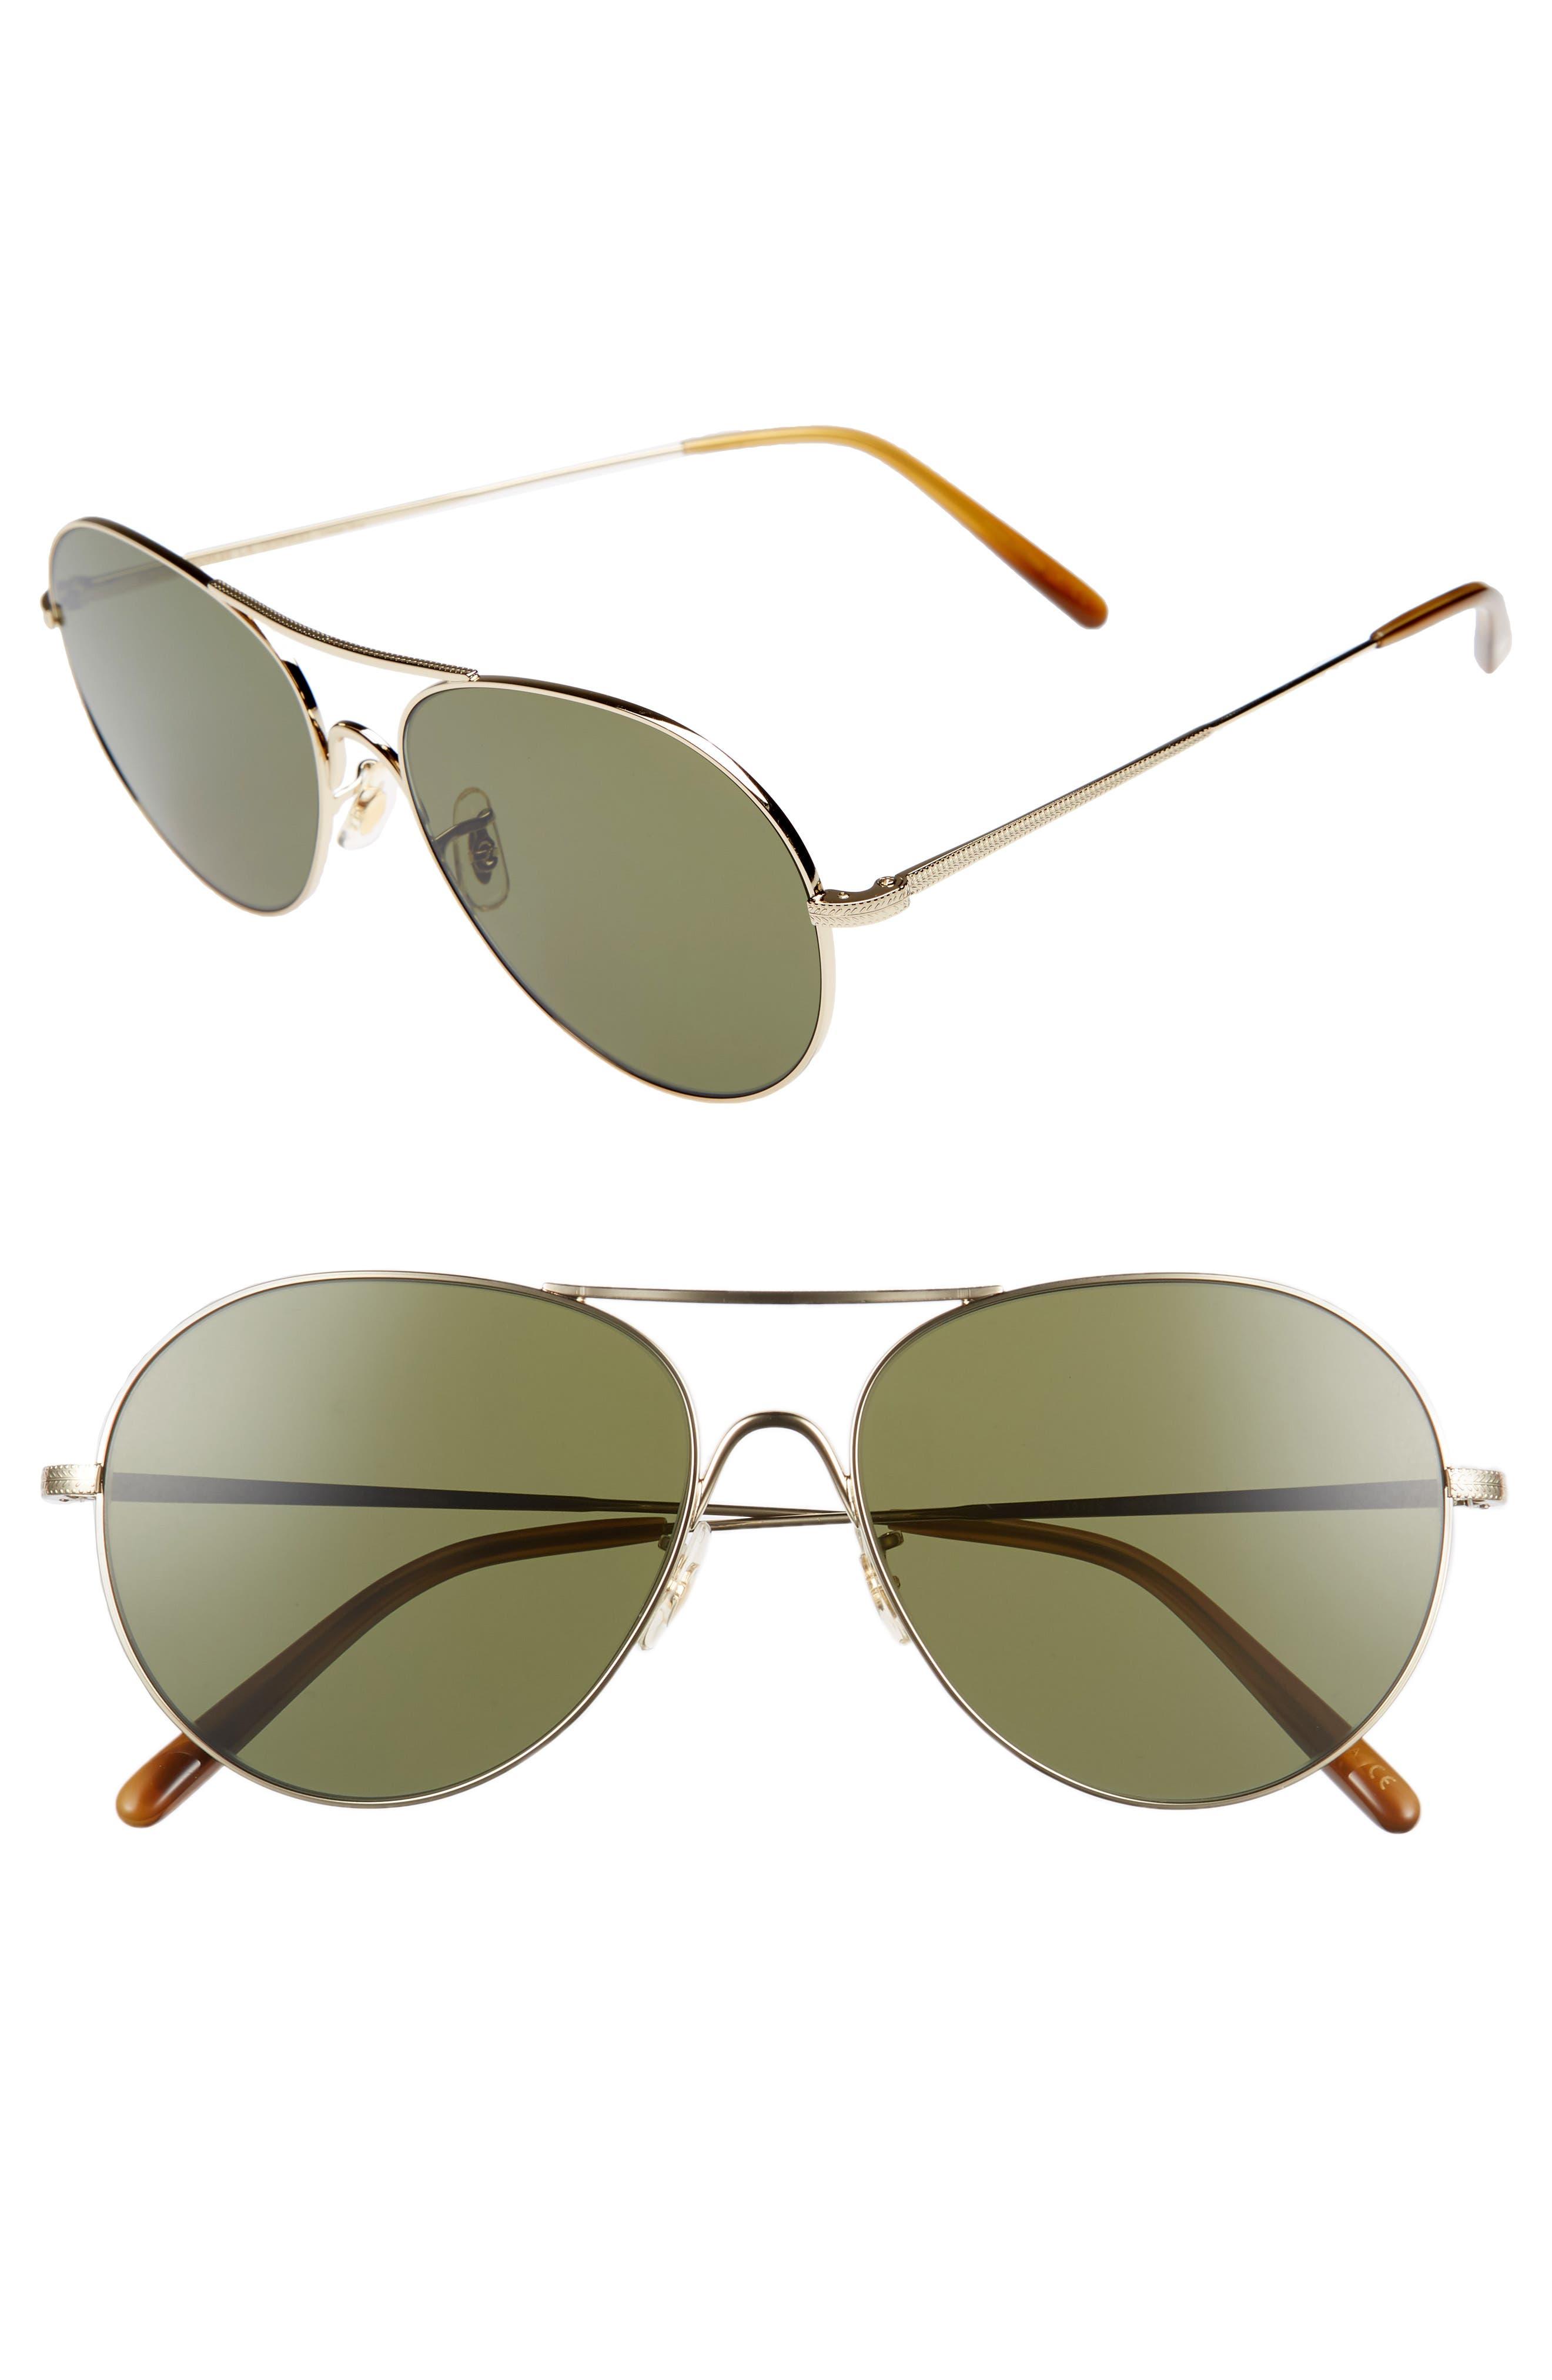 Rockmore 58mm Aviator Sunglasses,                         Main,                         color, Gold/ Green